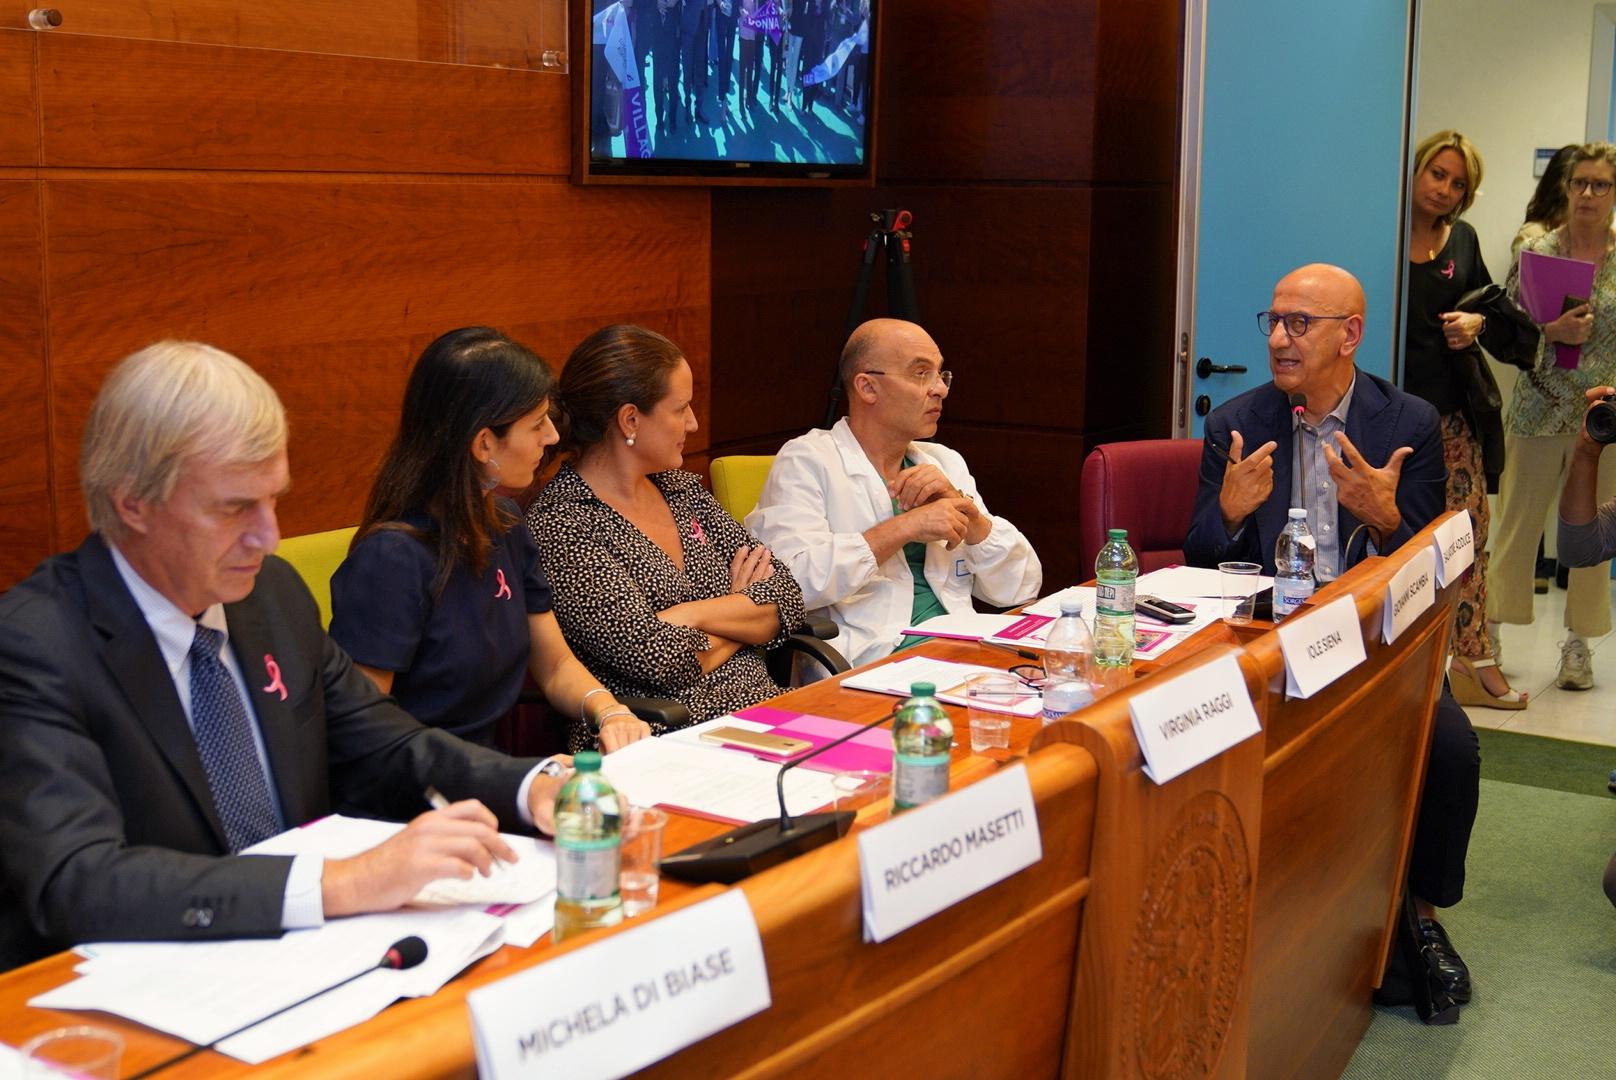 R. Masetti, V. Raggi, I. Siena, G. Scambia, S. Adduce